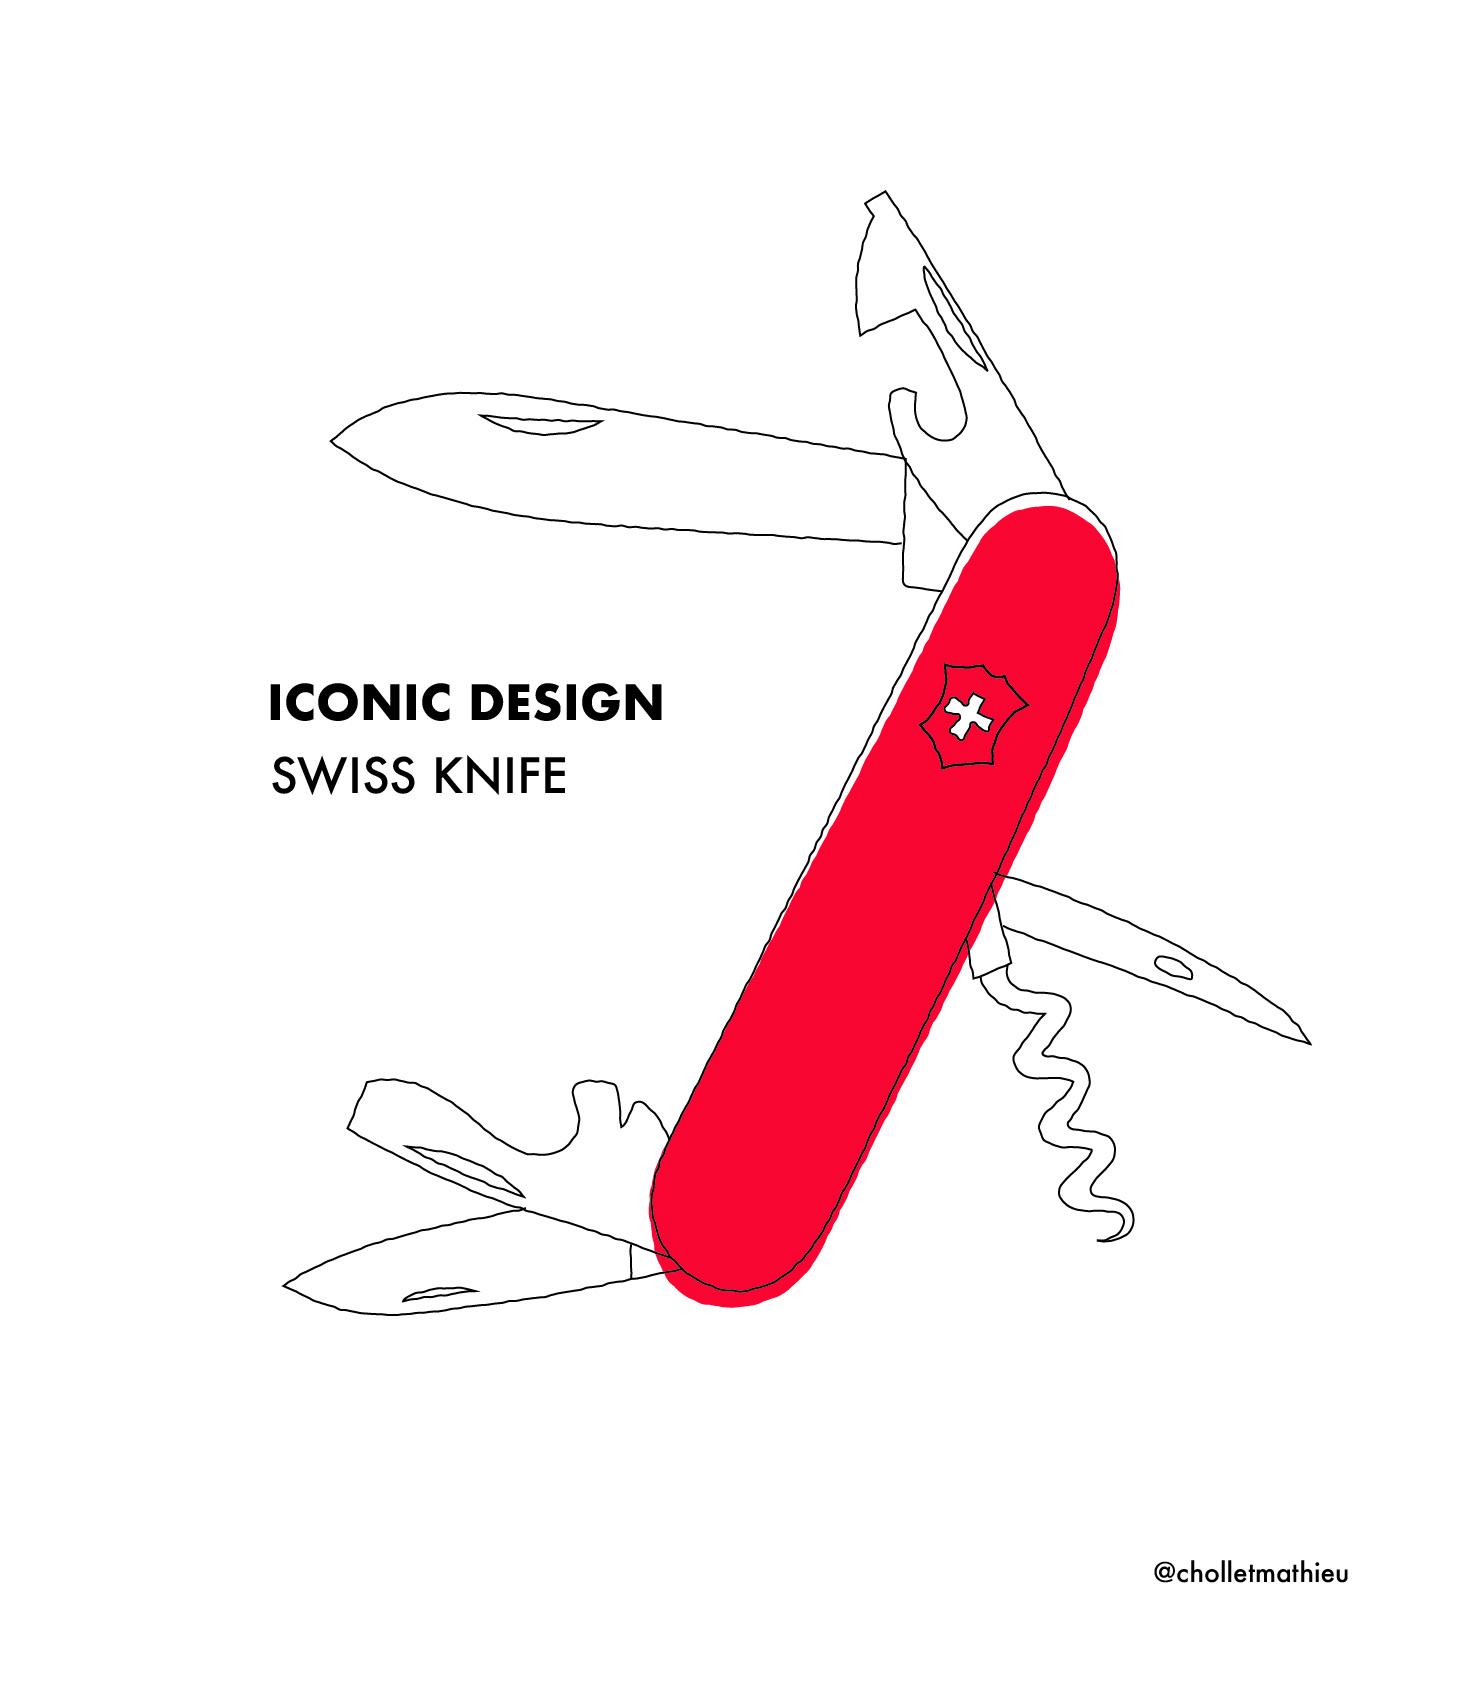 IconicDesign-2